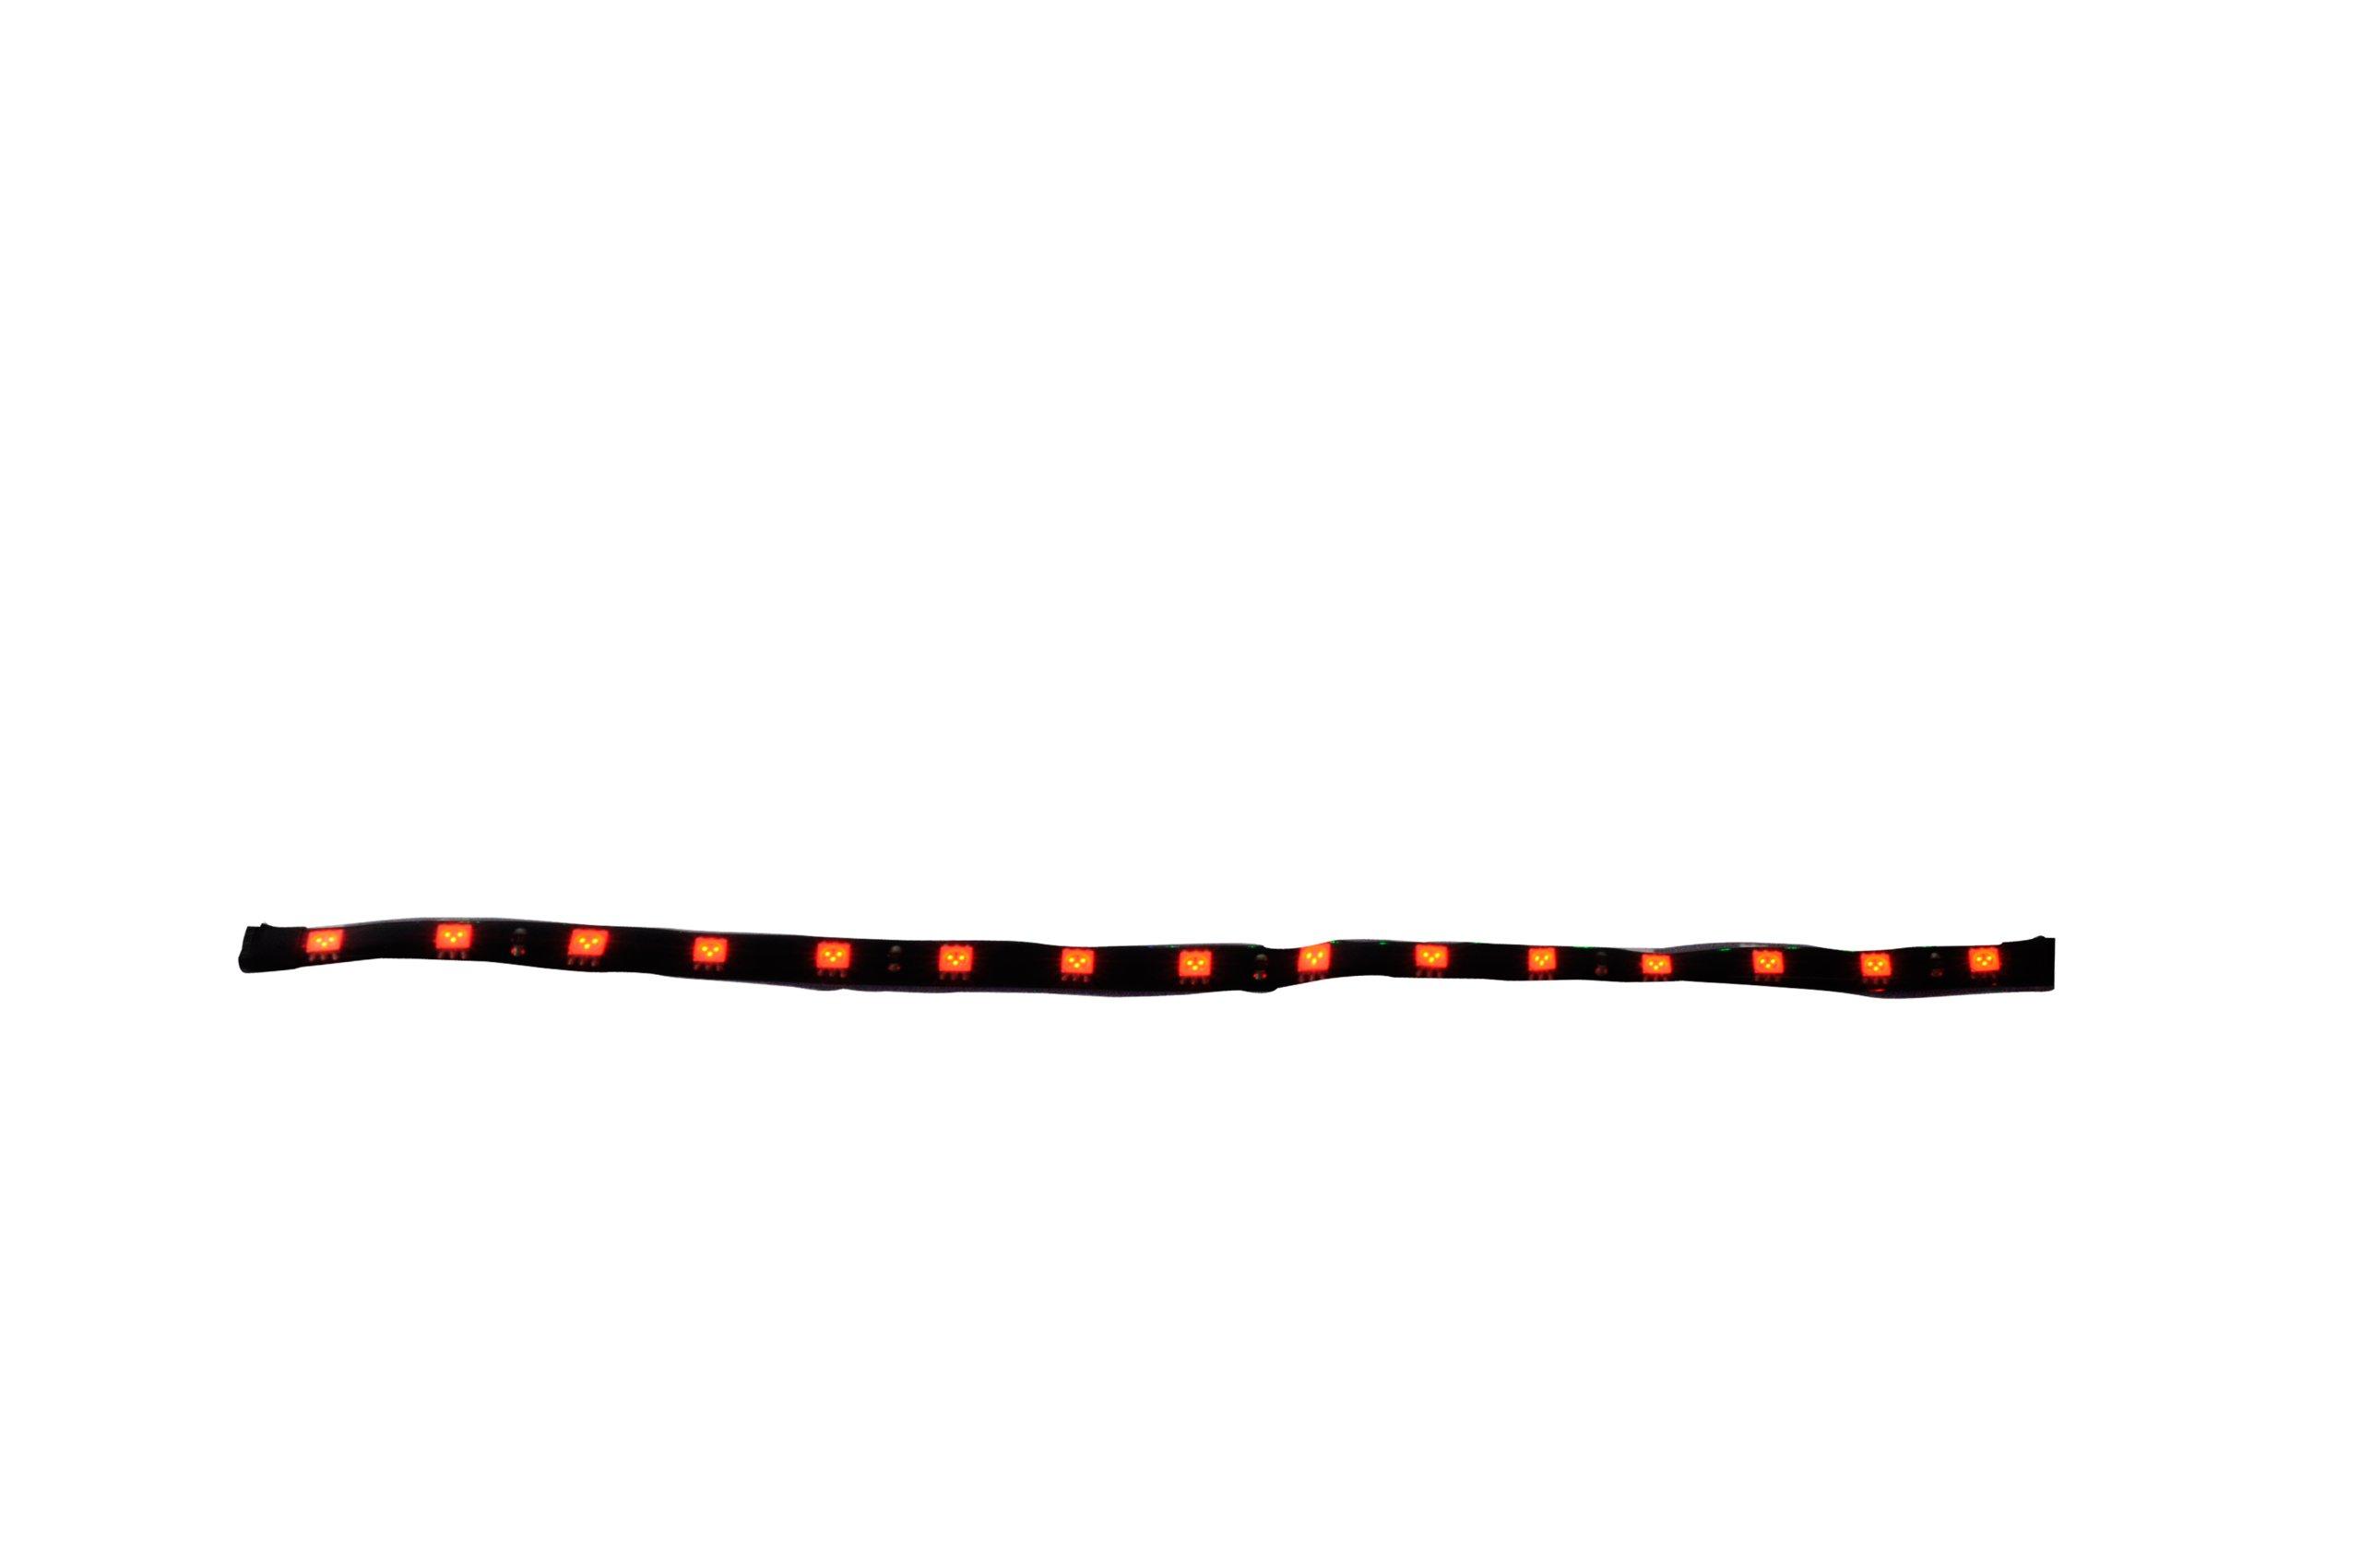 Silverstone Tek Flexible 30cm LED 12-Inch Light Strip (LS01R)